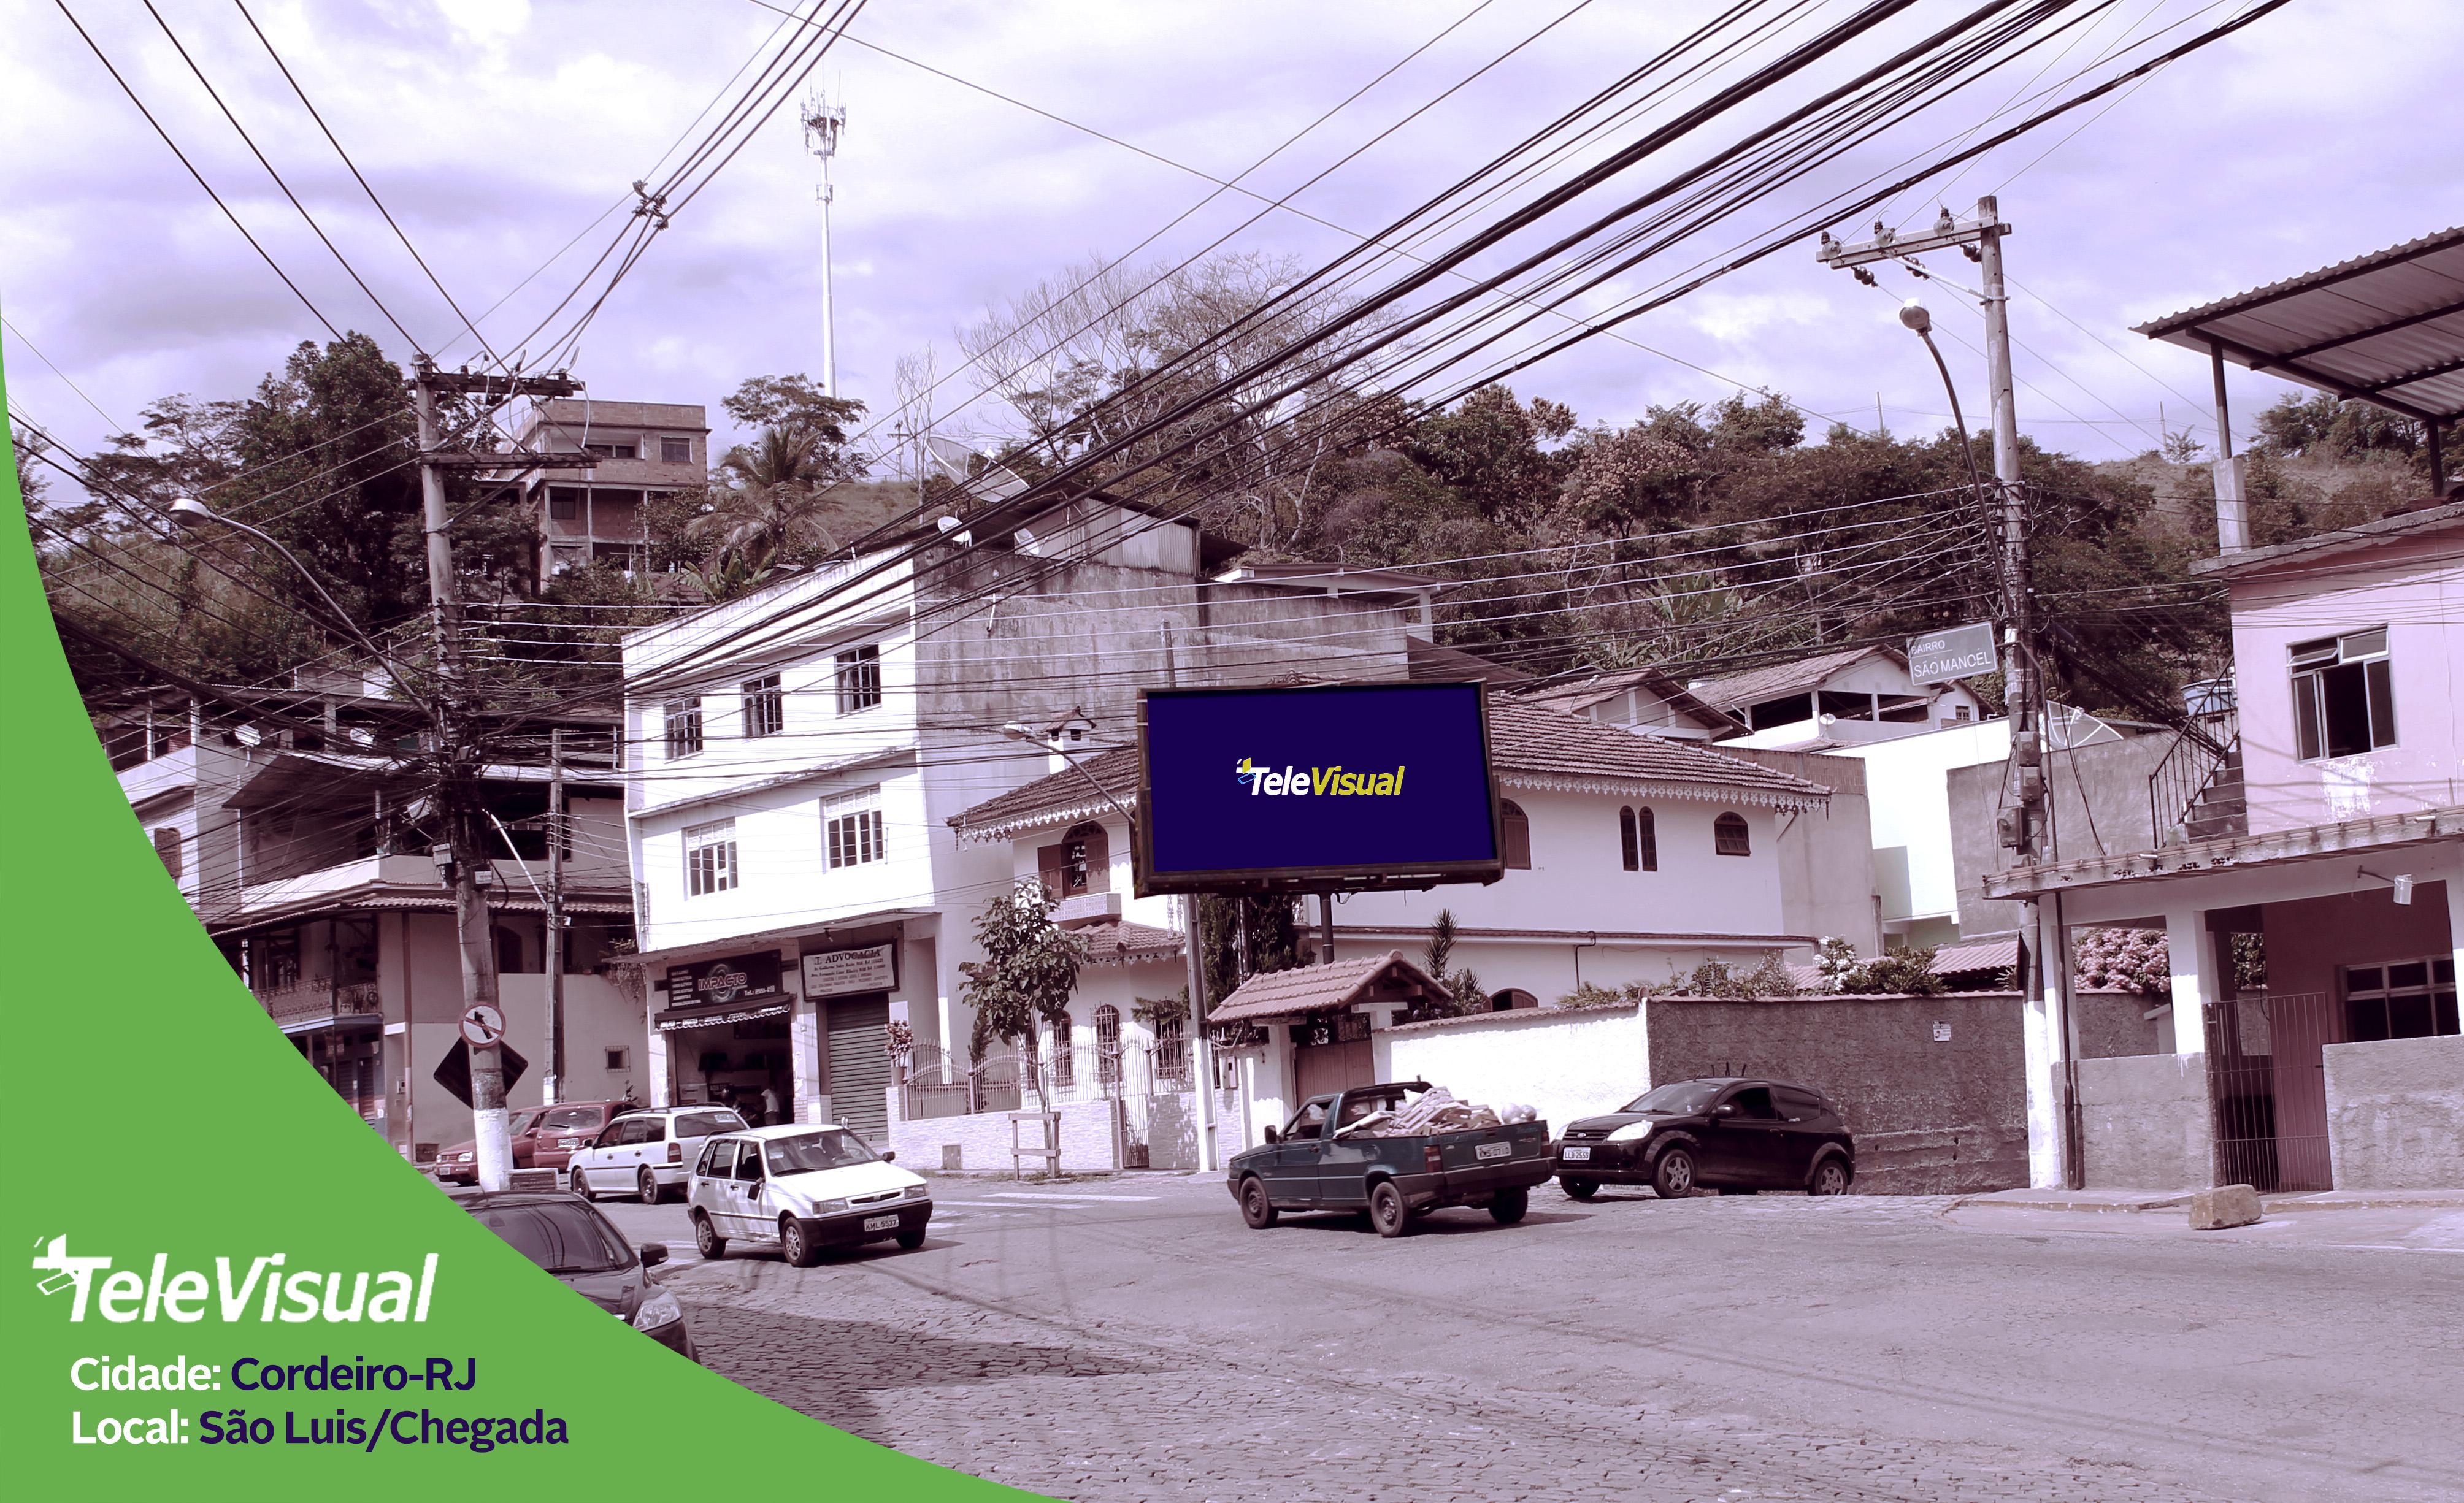 Televisual Cordeiro-RJ